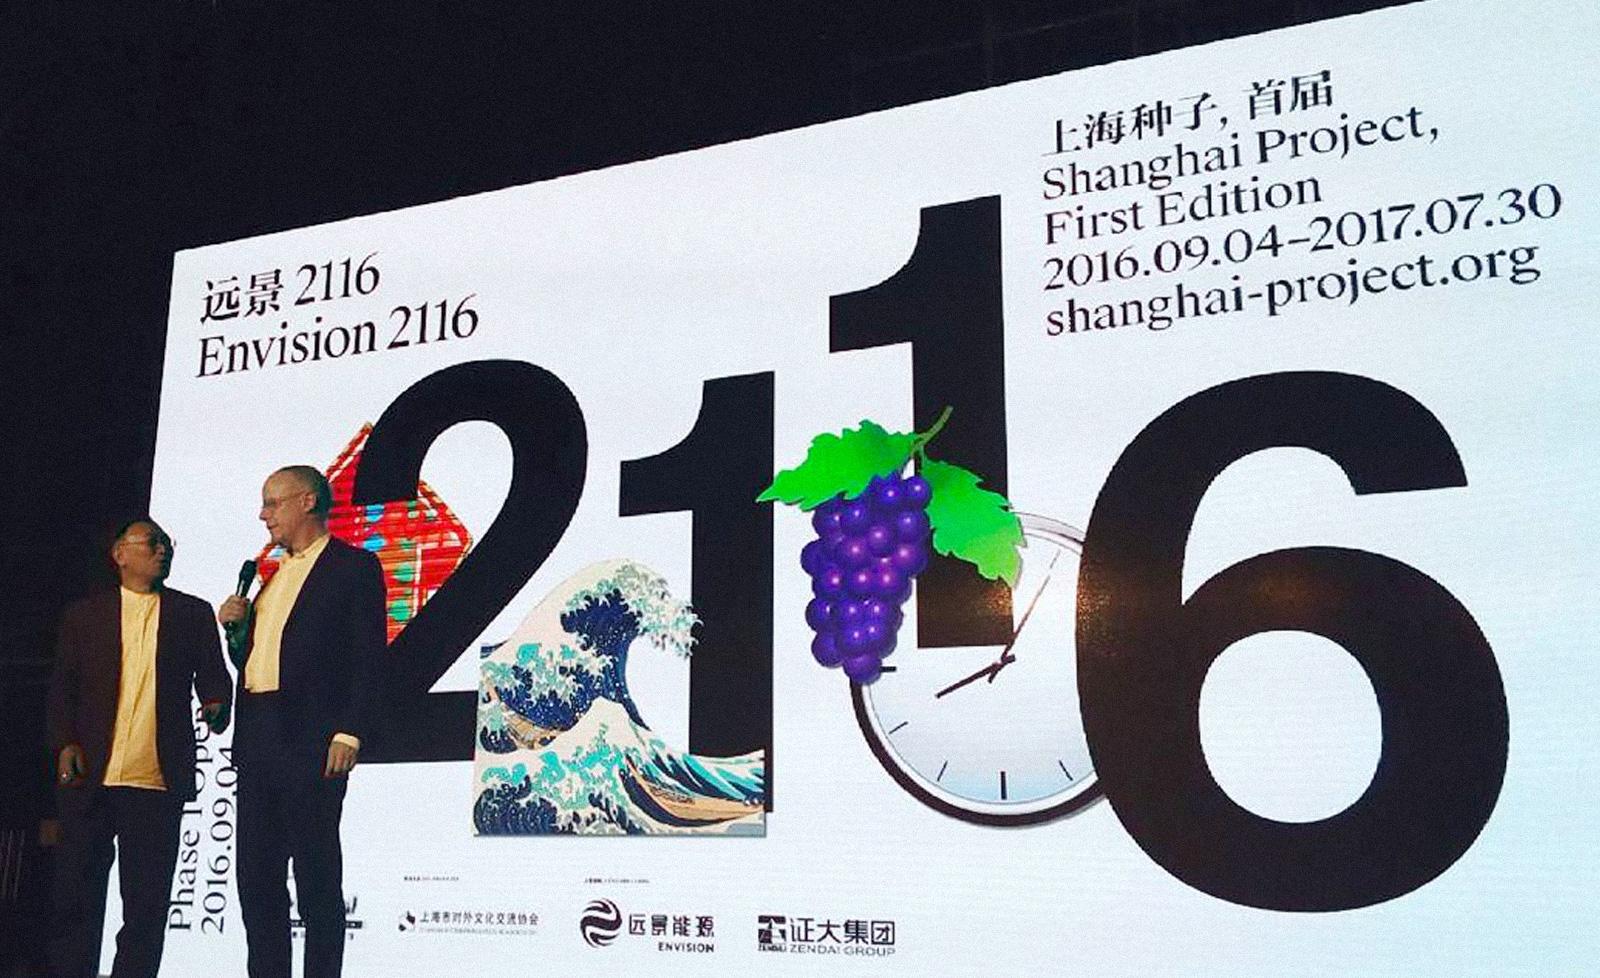 Shanghai Project